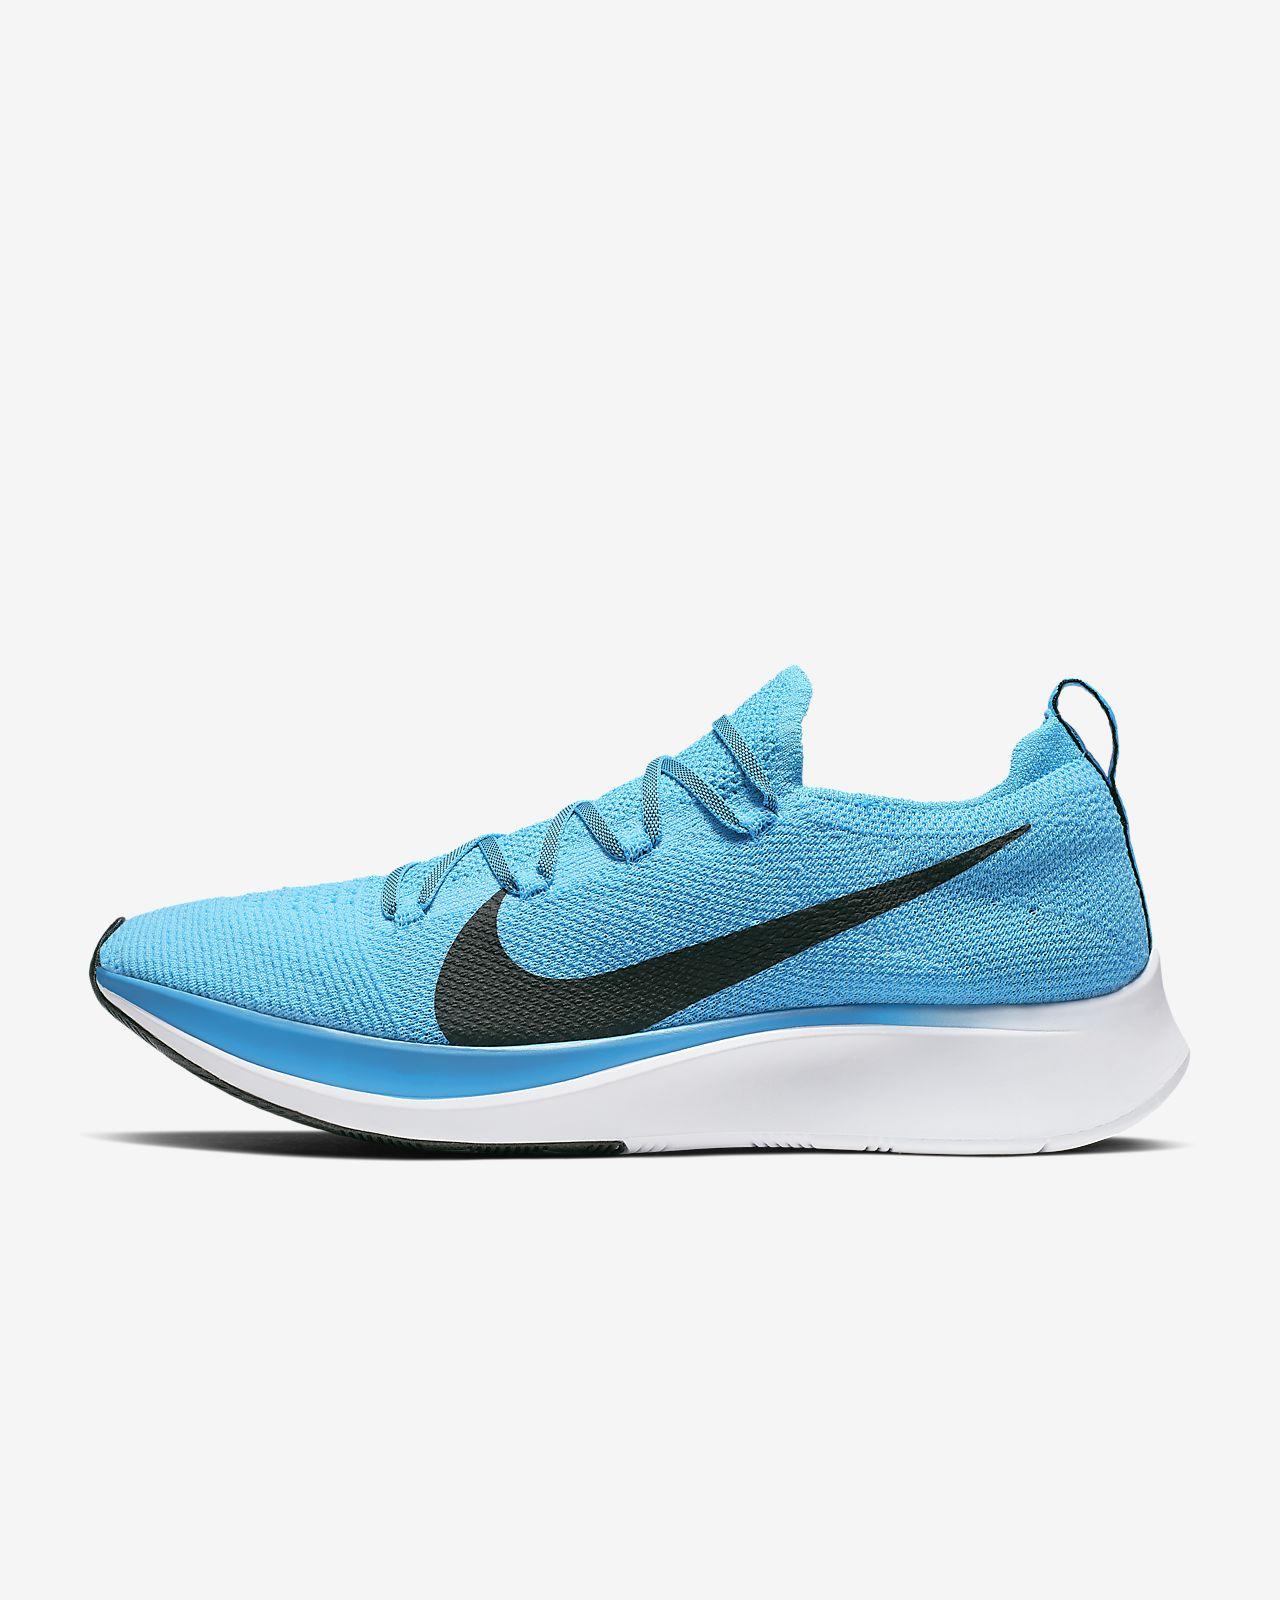 free shipping 8a71f 07a53 ... Scarpa da running Nike Zoom Fly Flyknit - Uomo